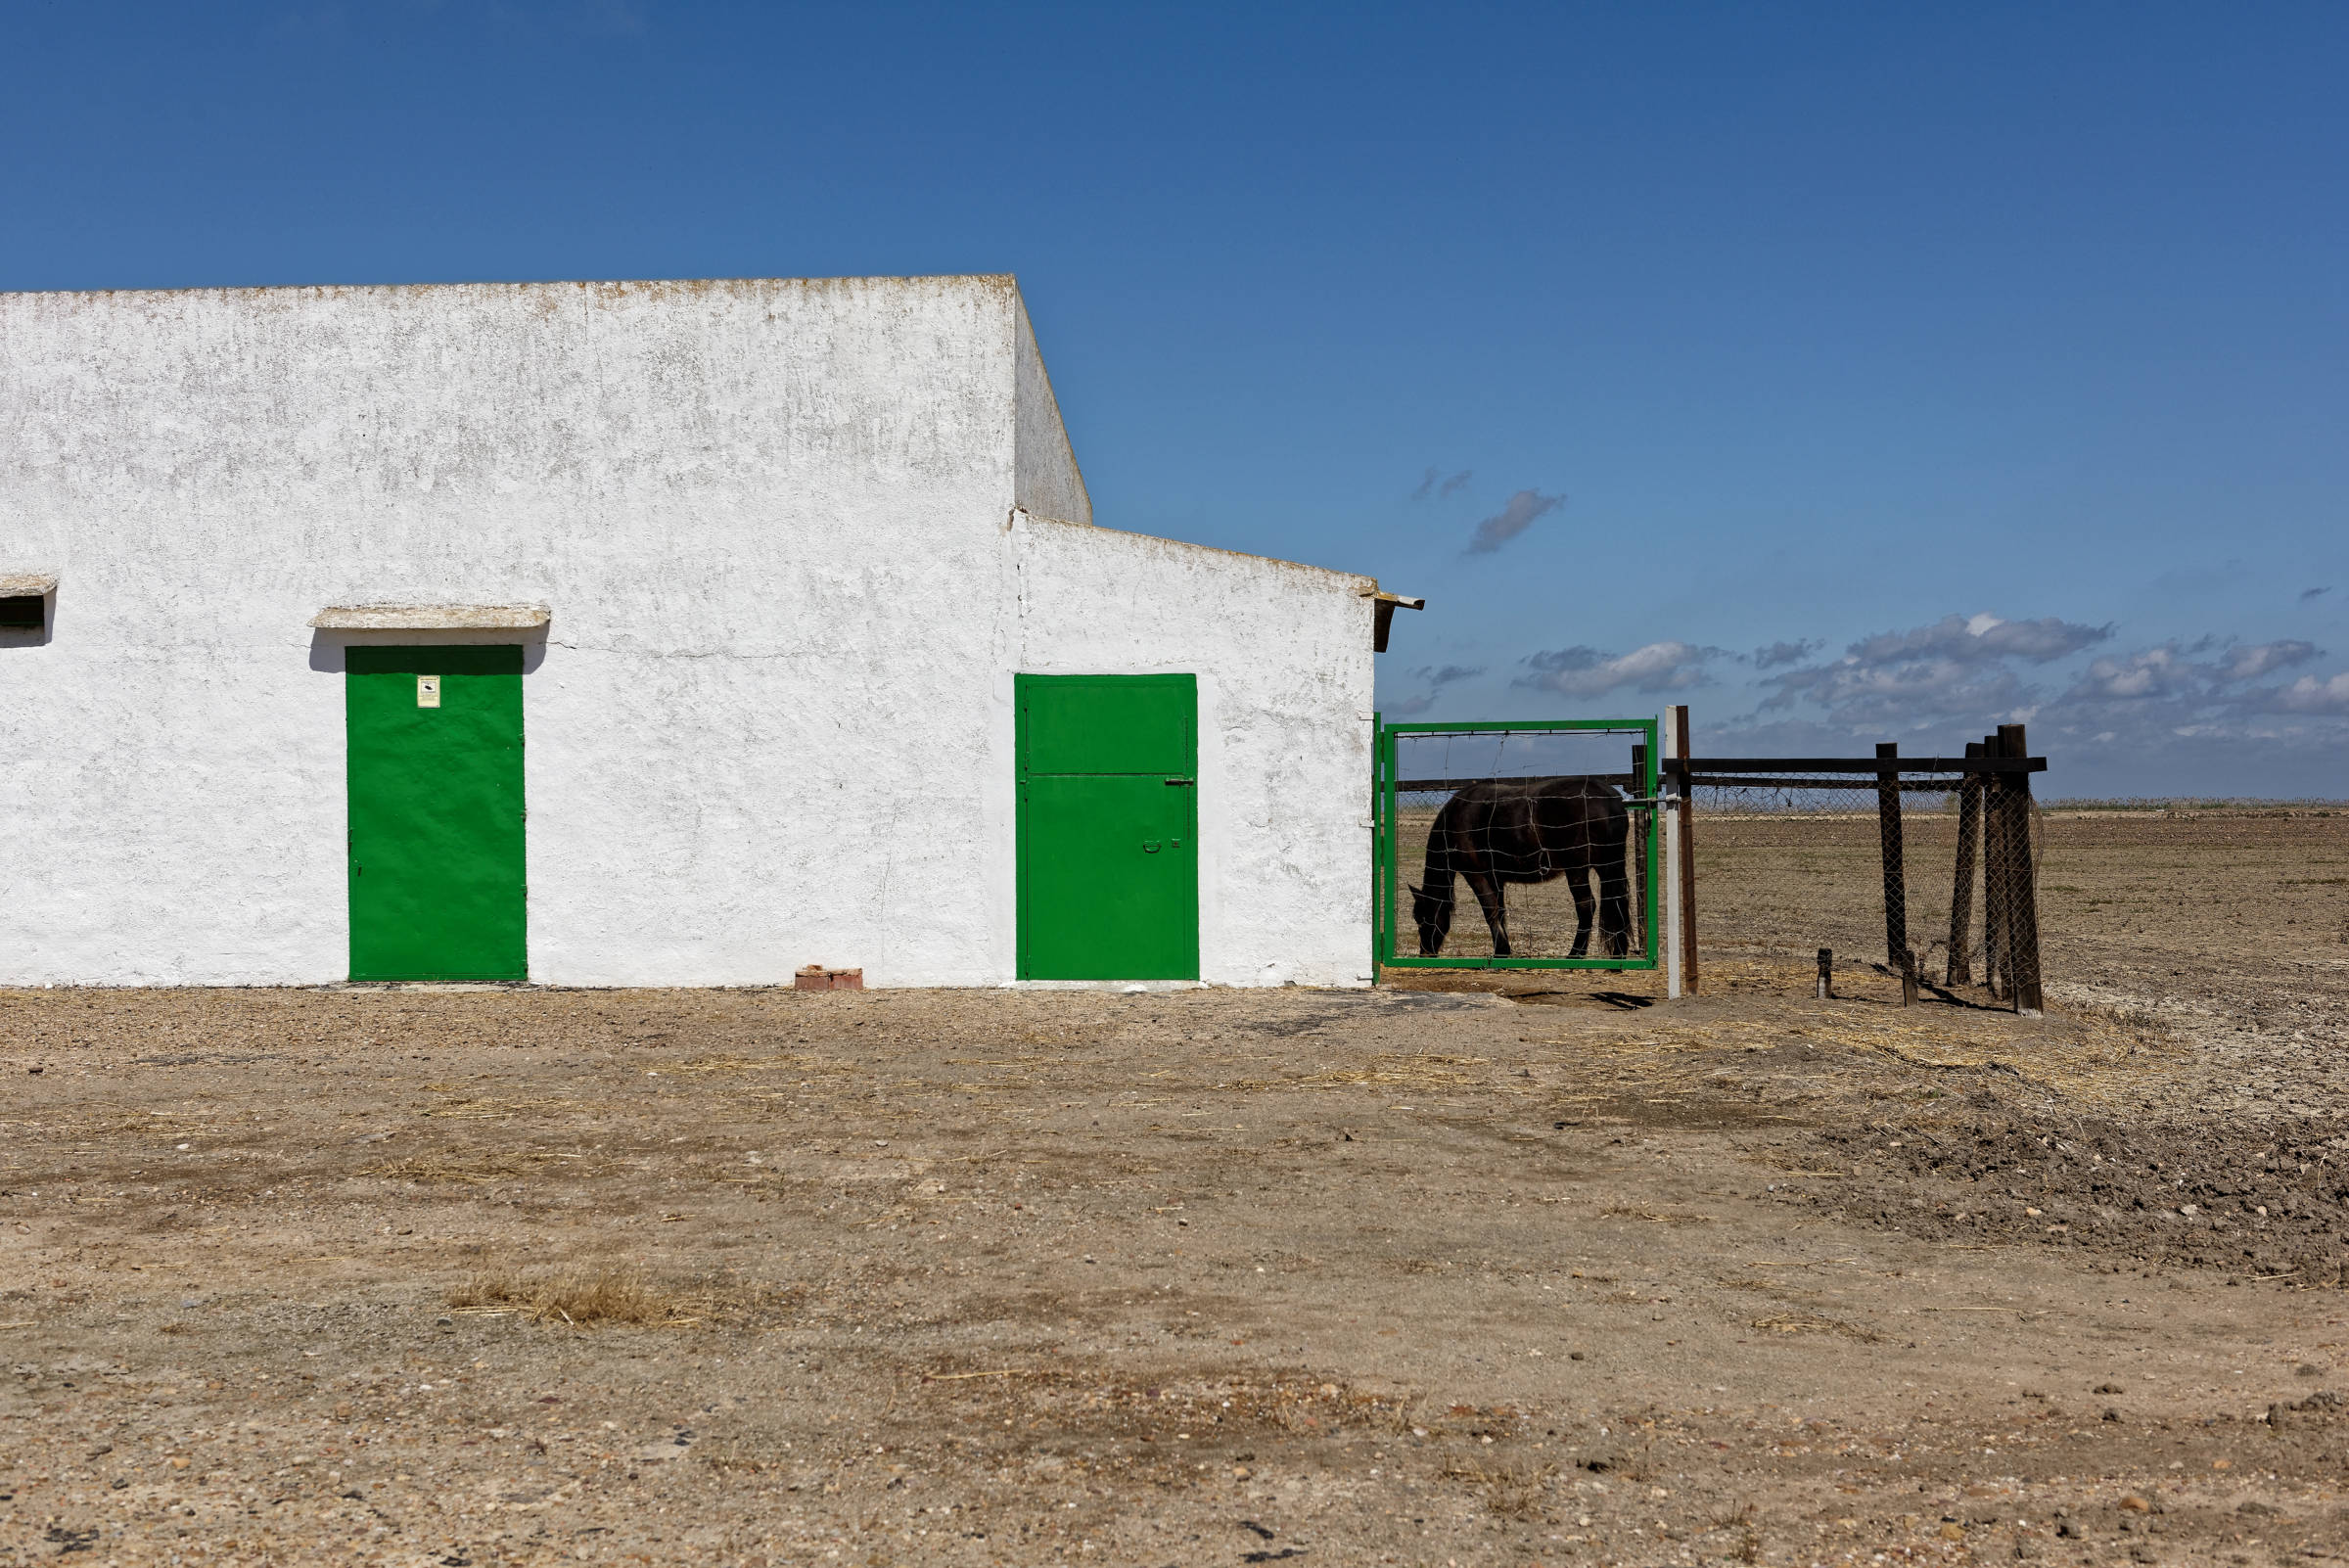 160414-Isla minima - Escobar (Andalousie) (11)_1